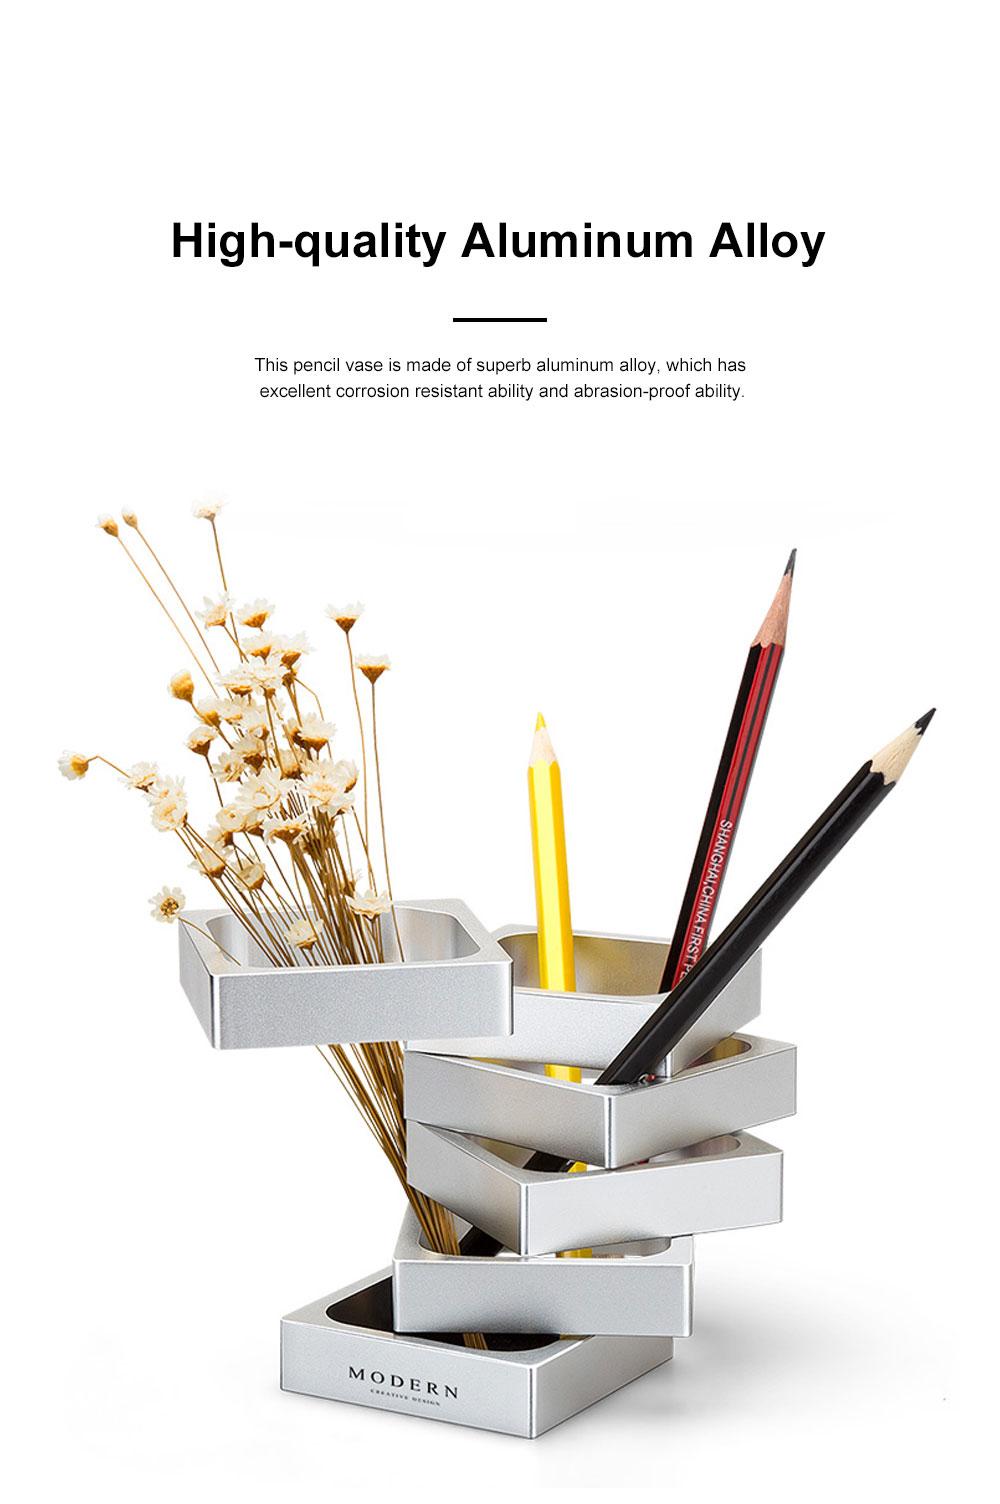 Creative Changeable Model Pencil Vase Brush Pot Office Desktop Ornament Aluminum Alloy Storage Box 1